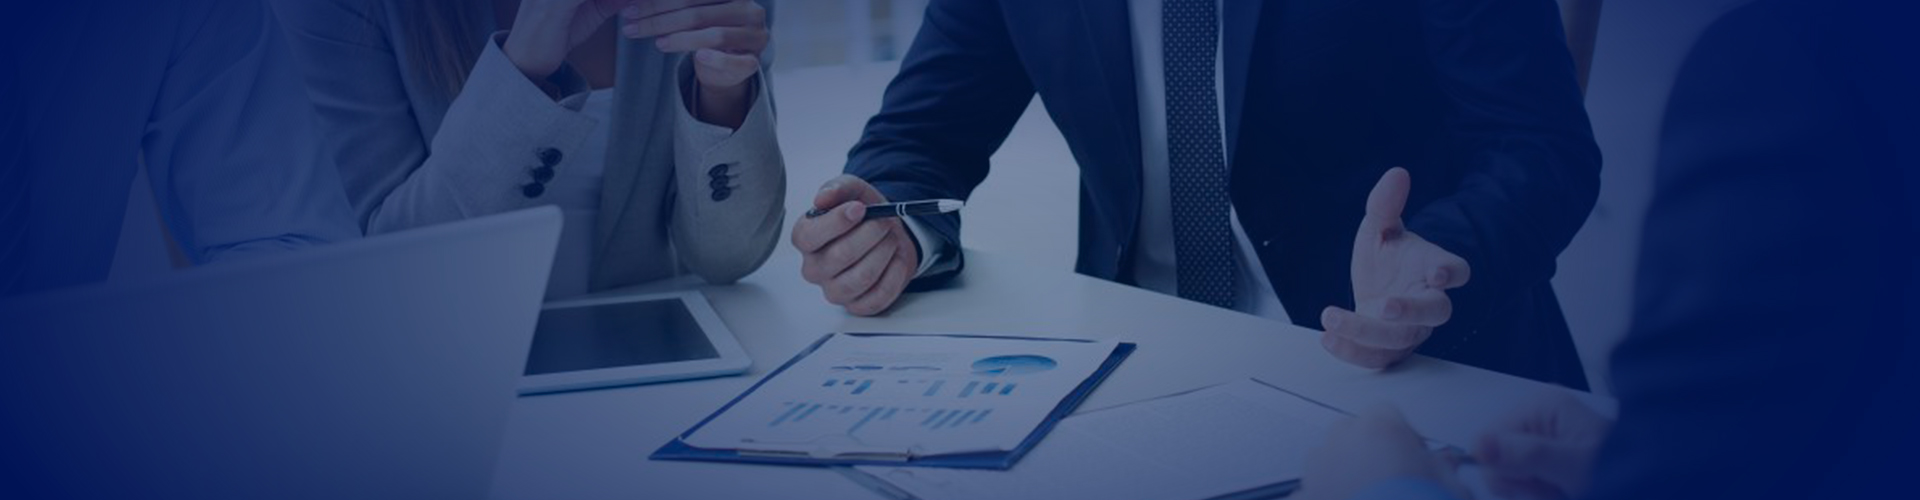 VAT Europe, Fiscal Representative | Tecnocompany